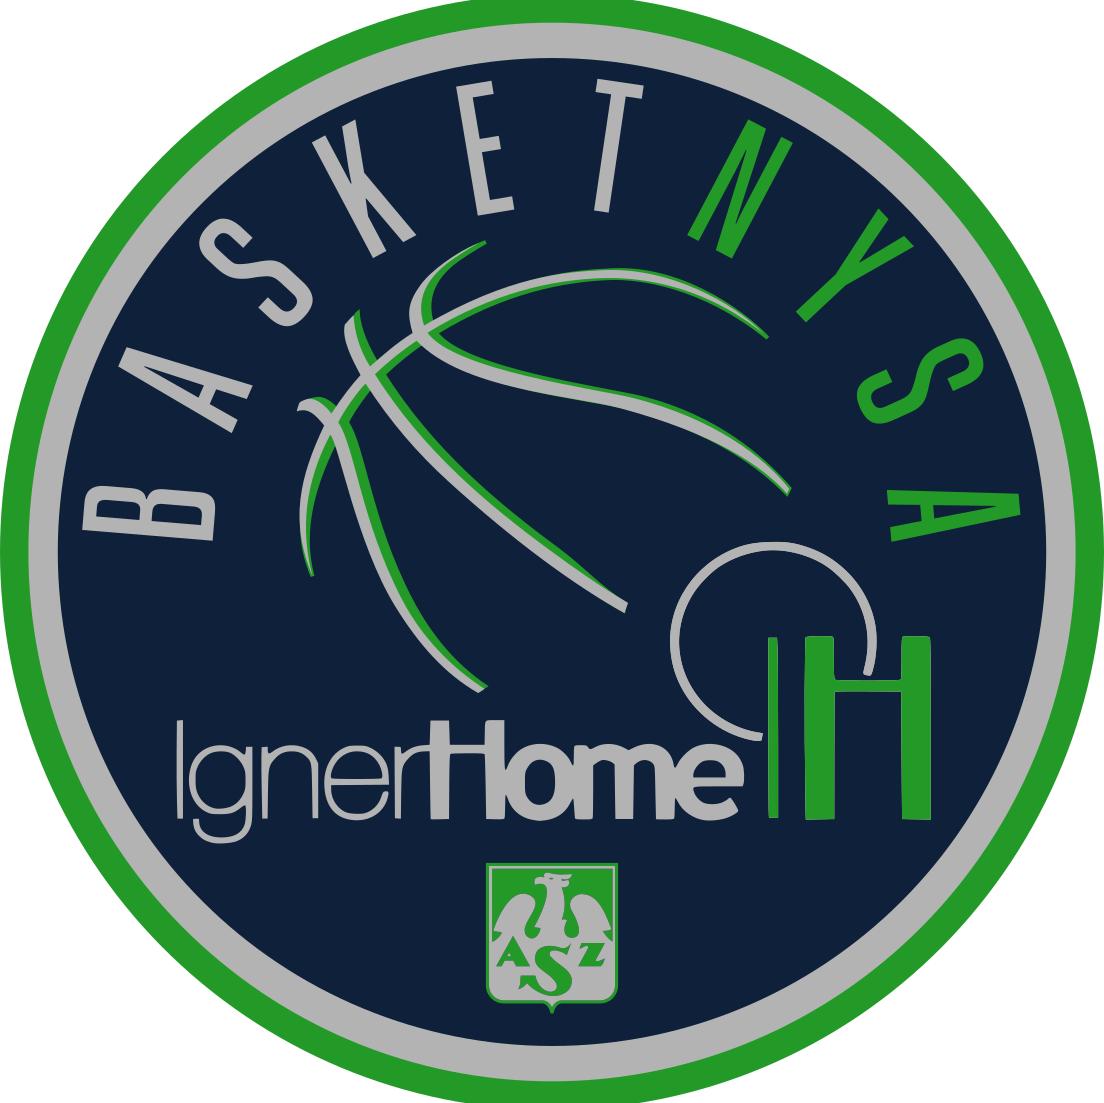 IgnerHome AZS Basket Nysa - KS Sudety Jelenia Góra